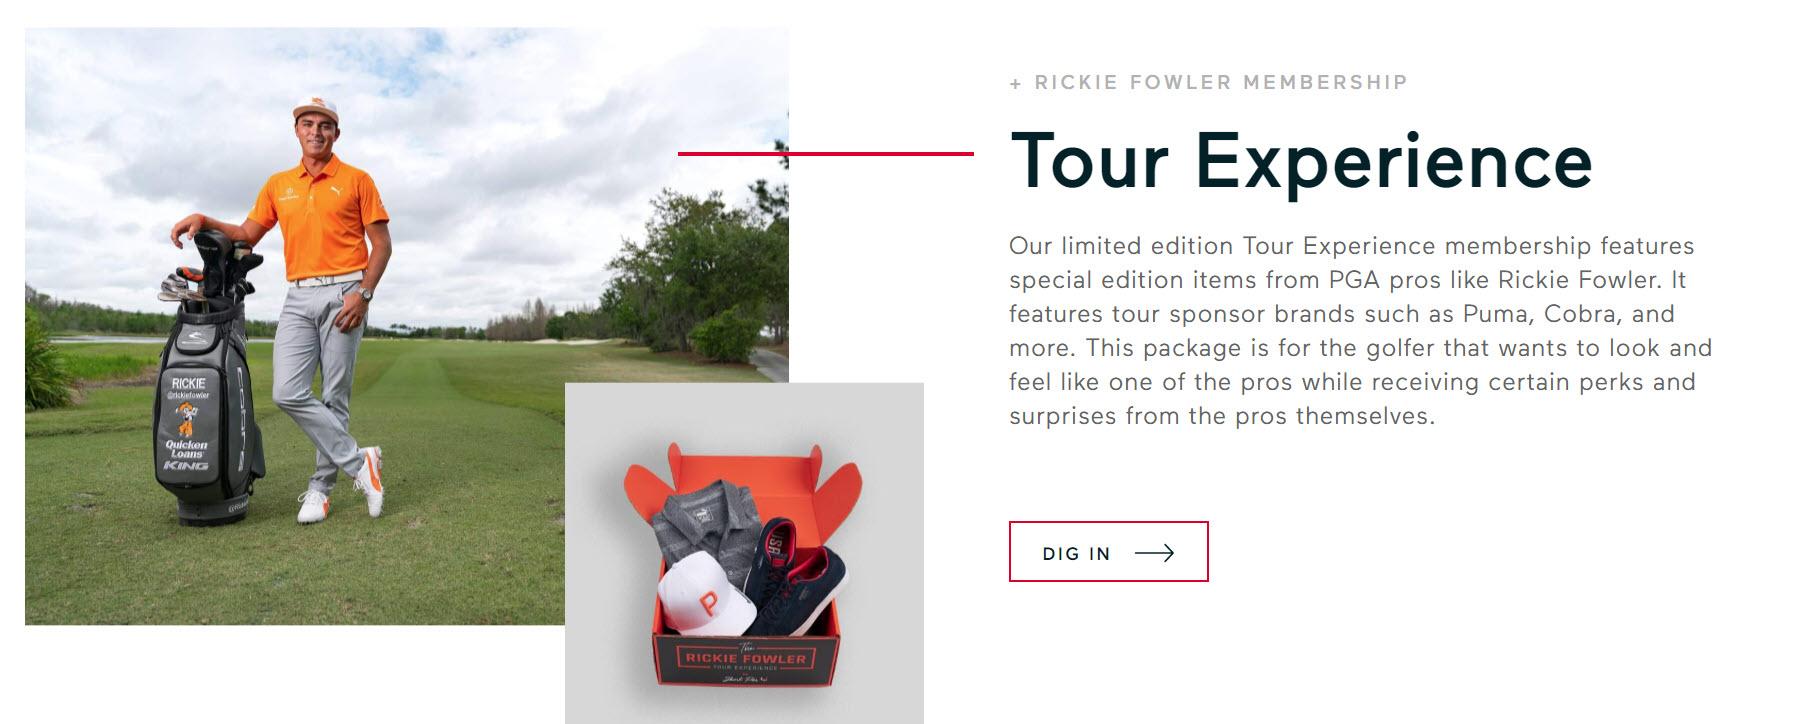 Short 4 Reviews Tour Exerience Membership